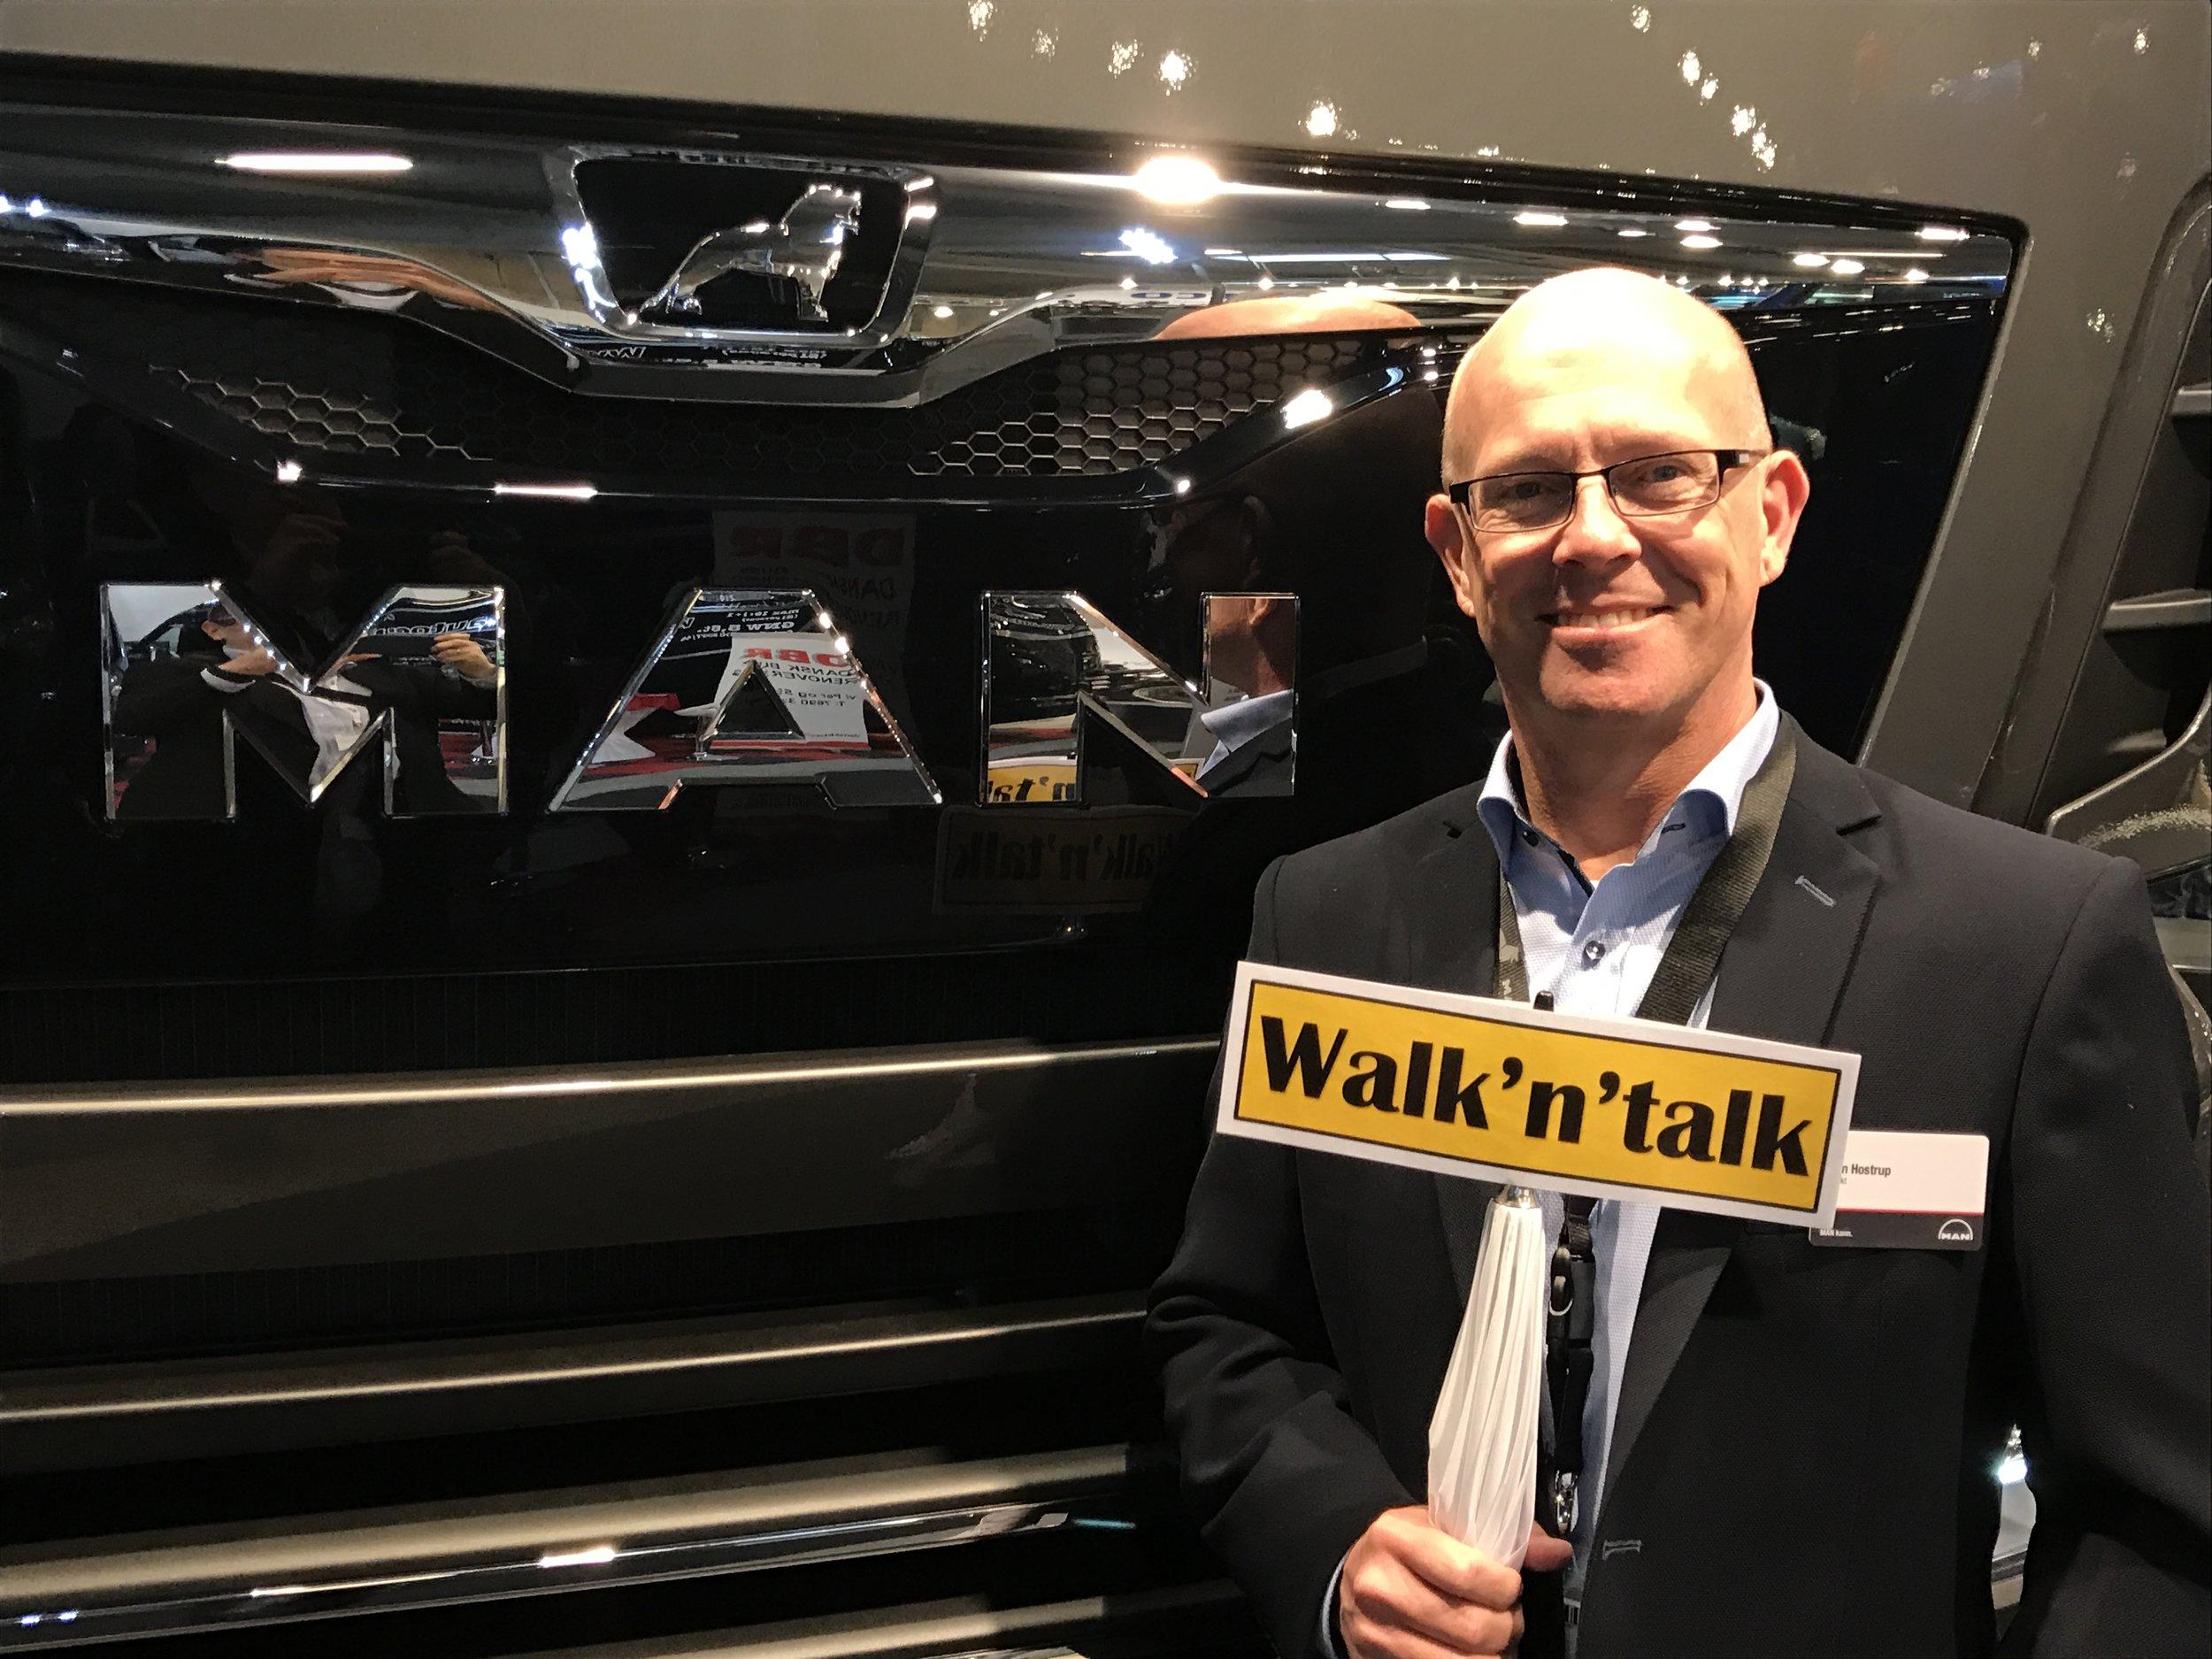 walk n talk (74).JPG